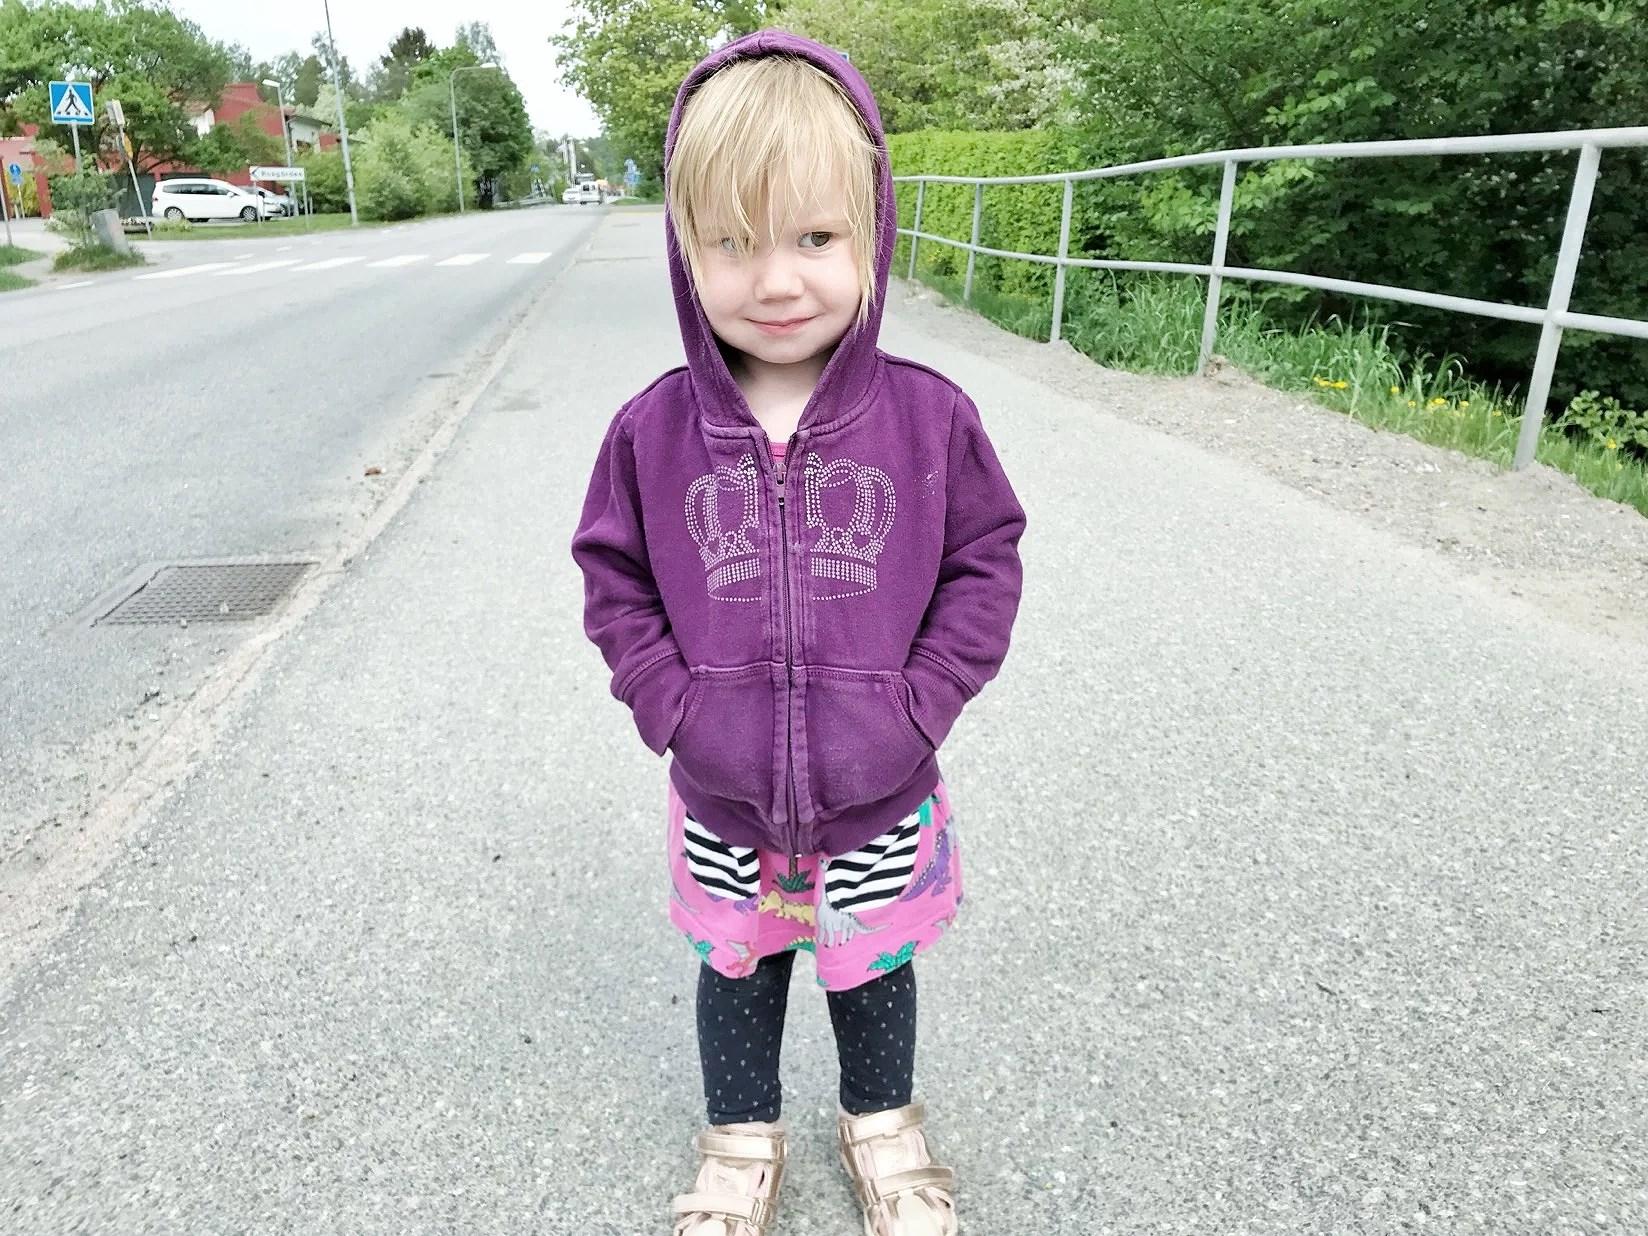 Min dotter hon kan hon